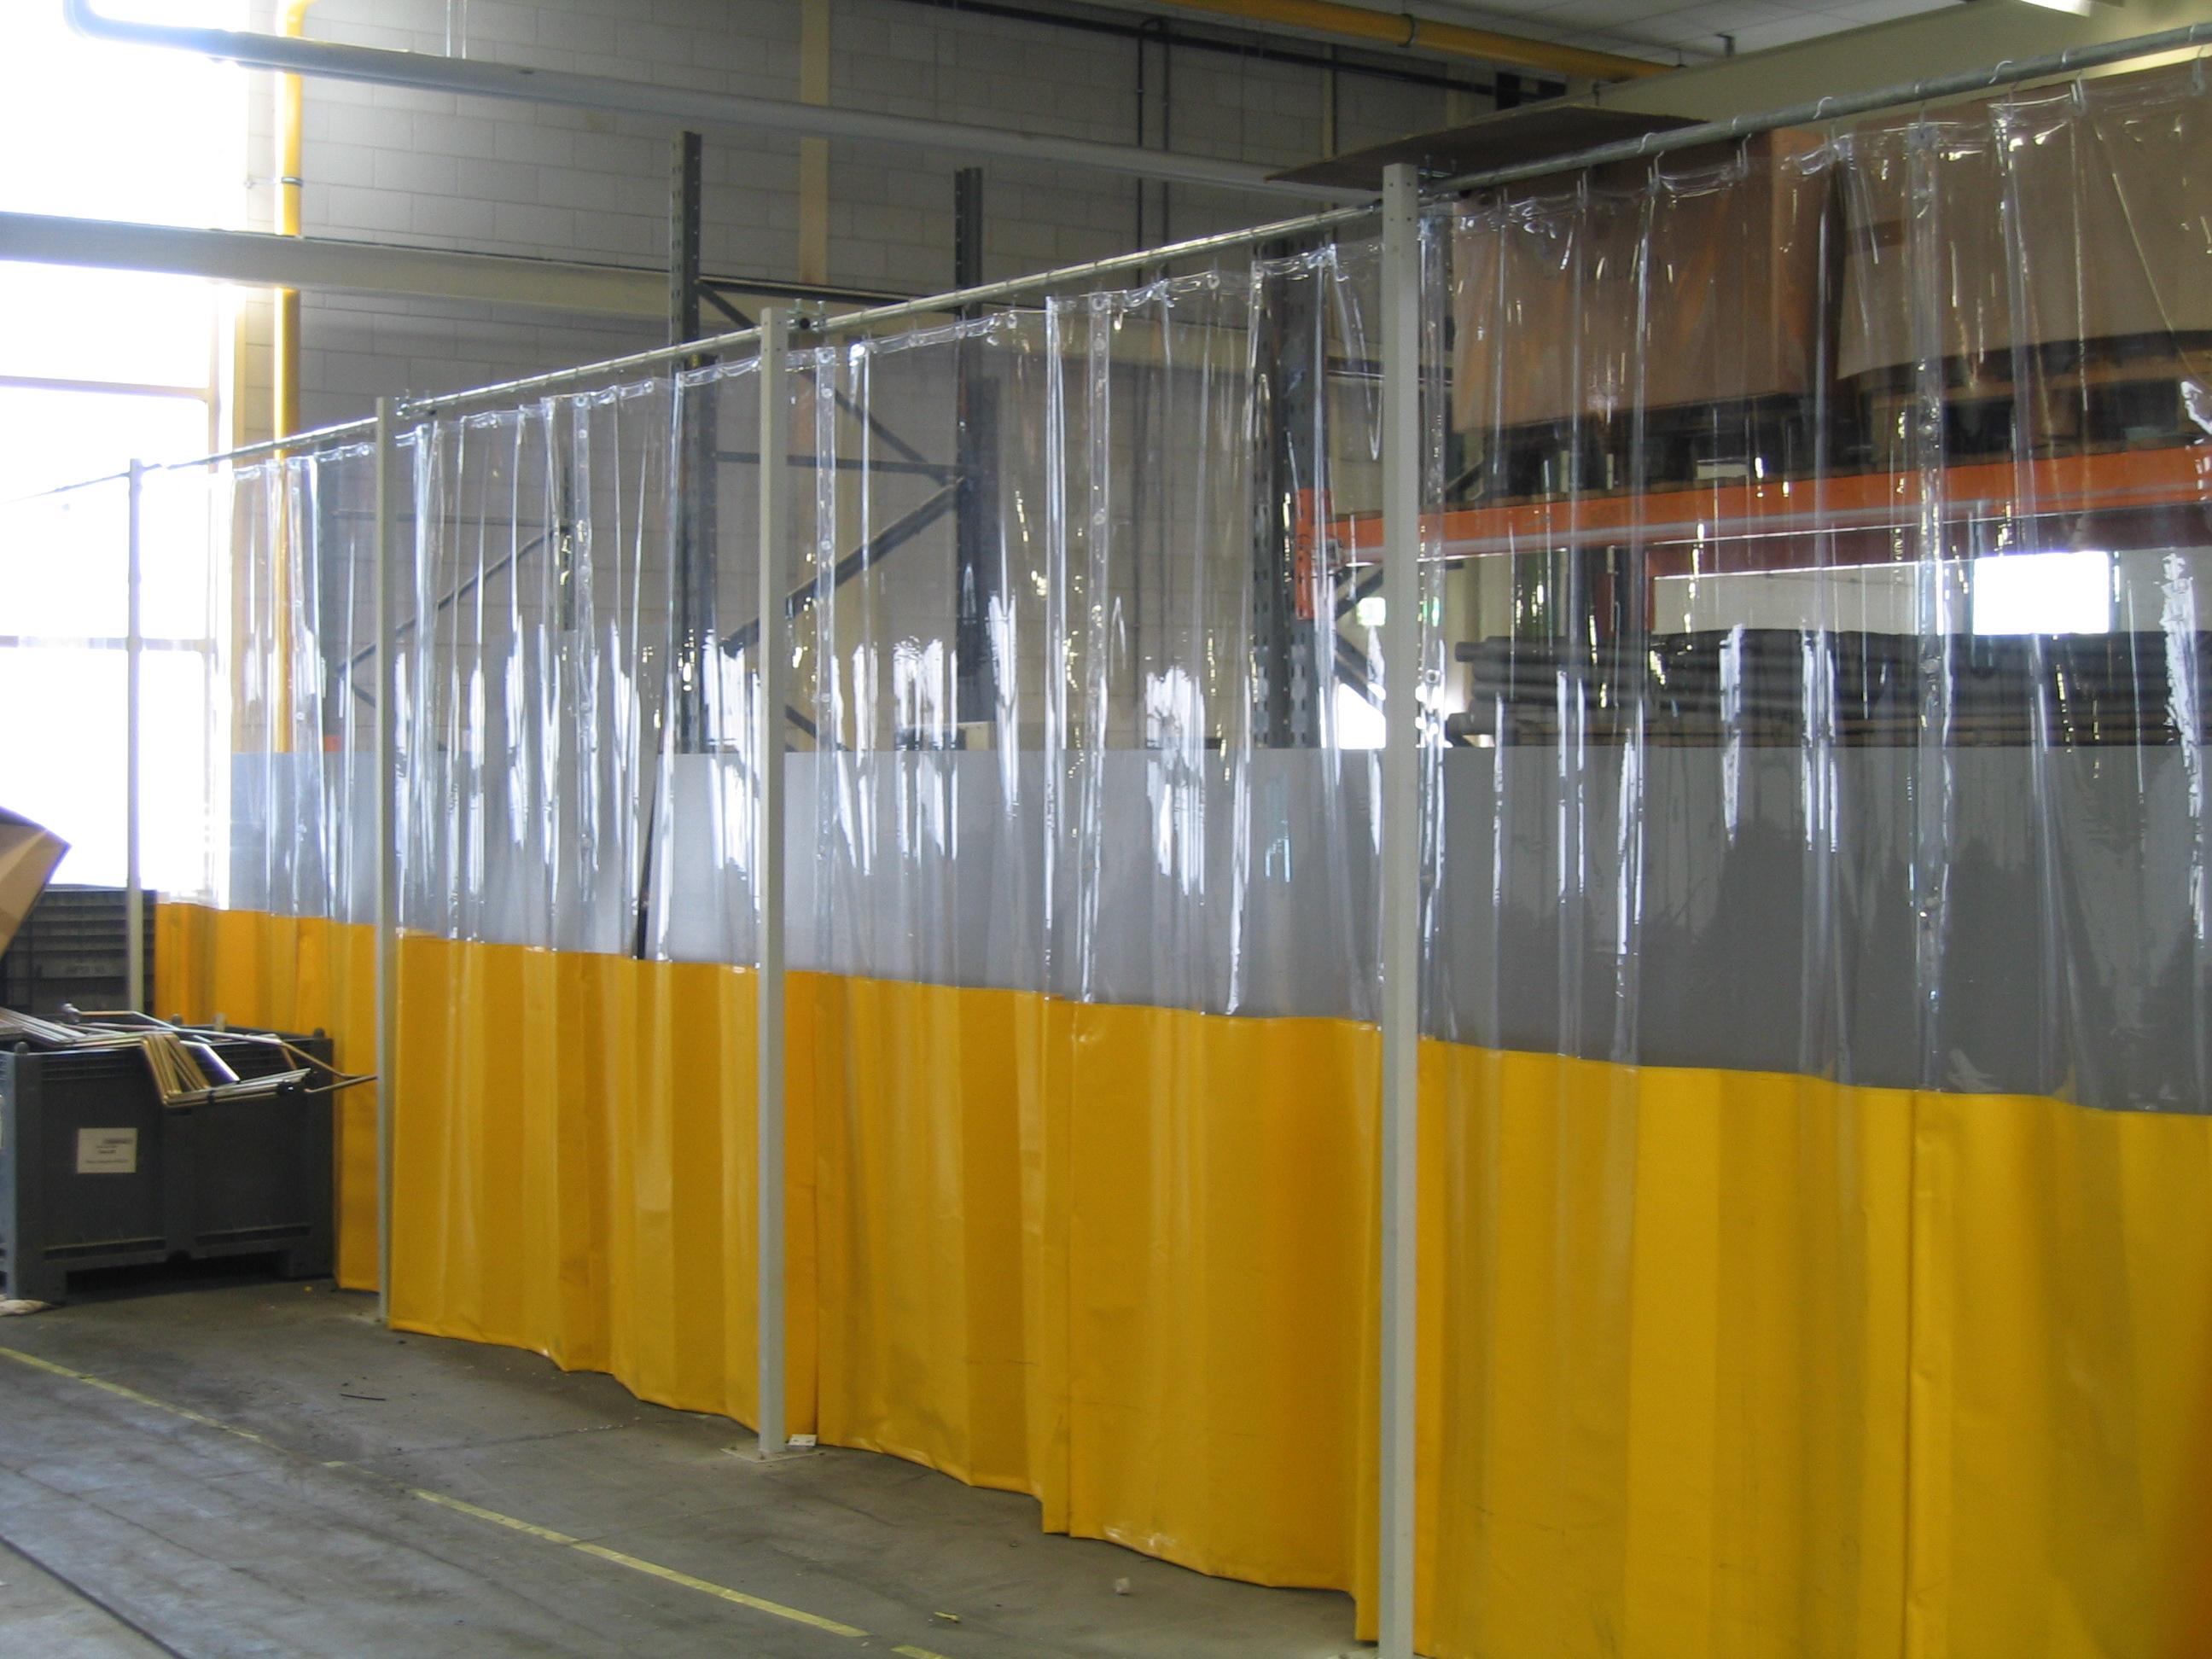 Stofoverlast - Industriegordijn.nl